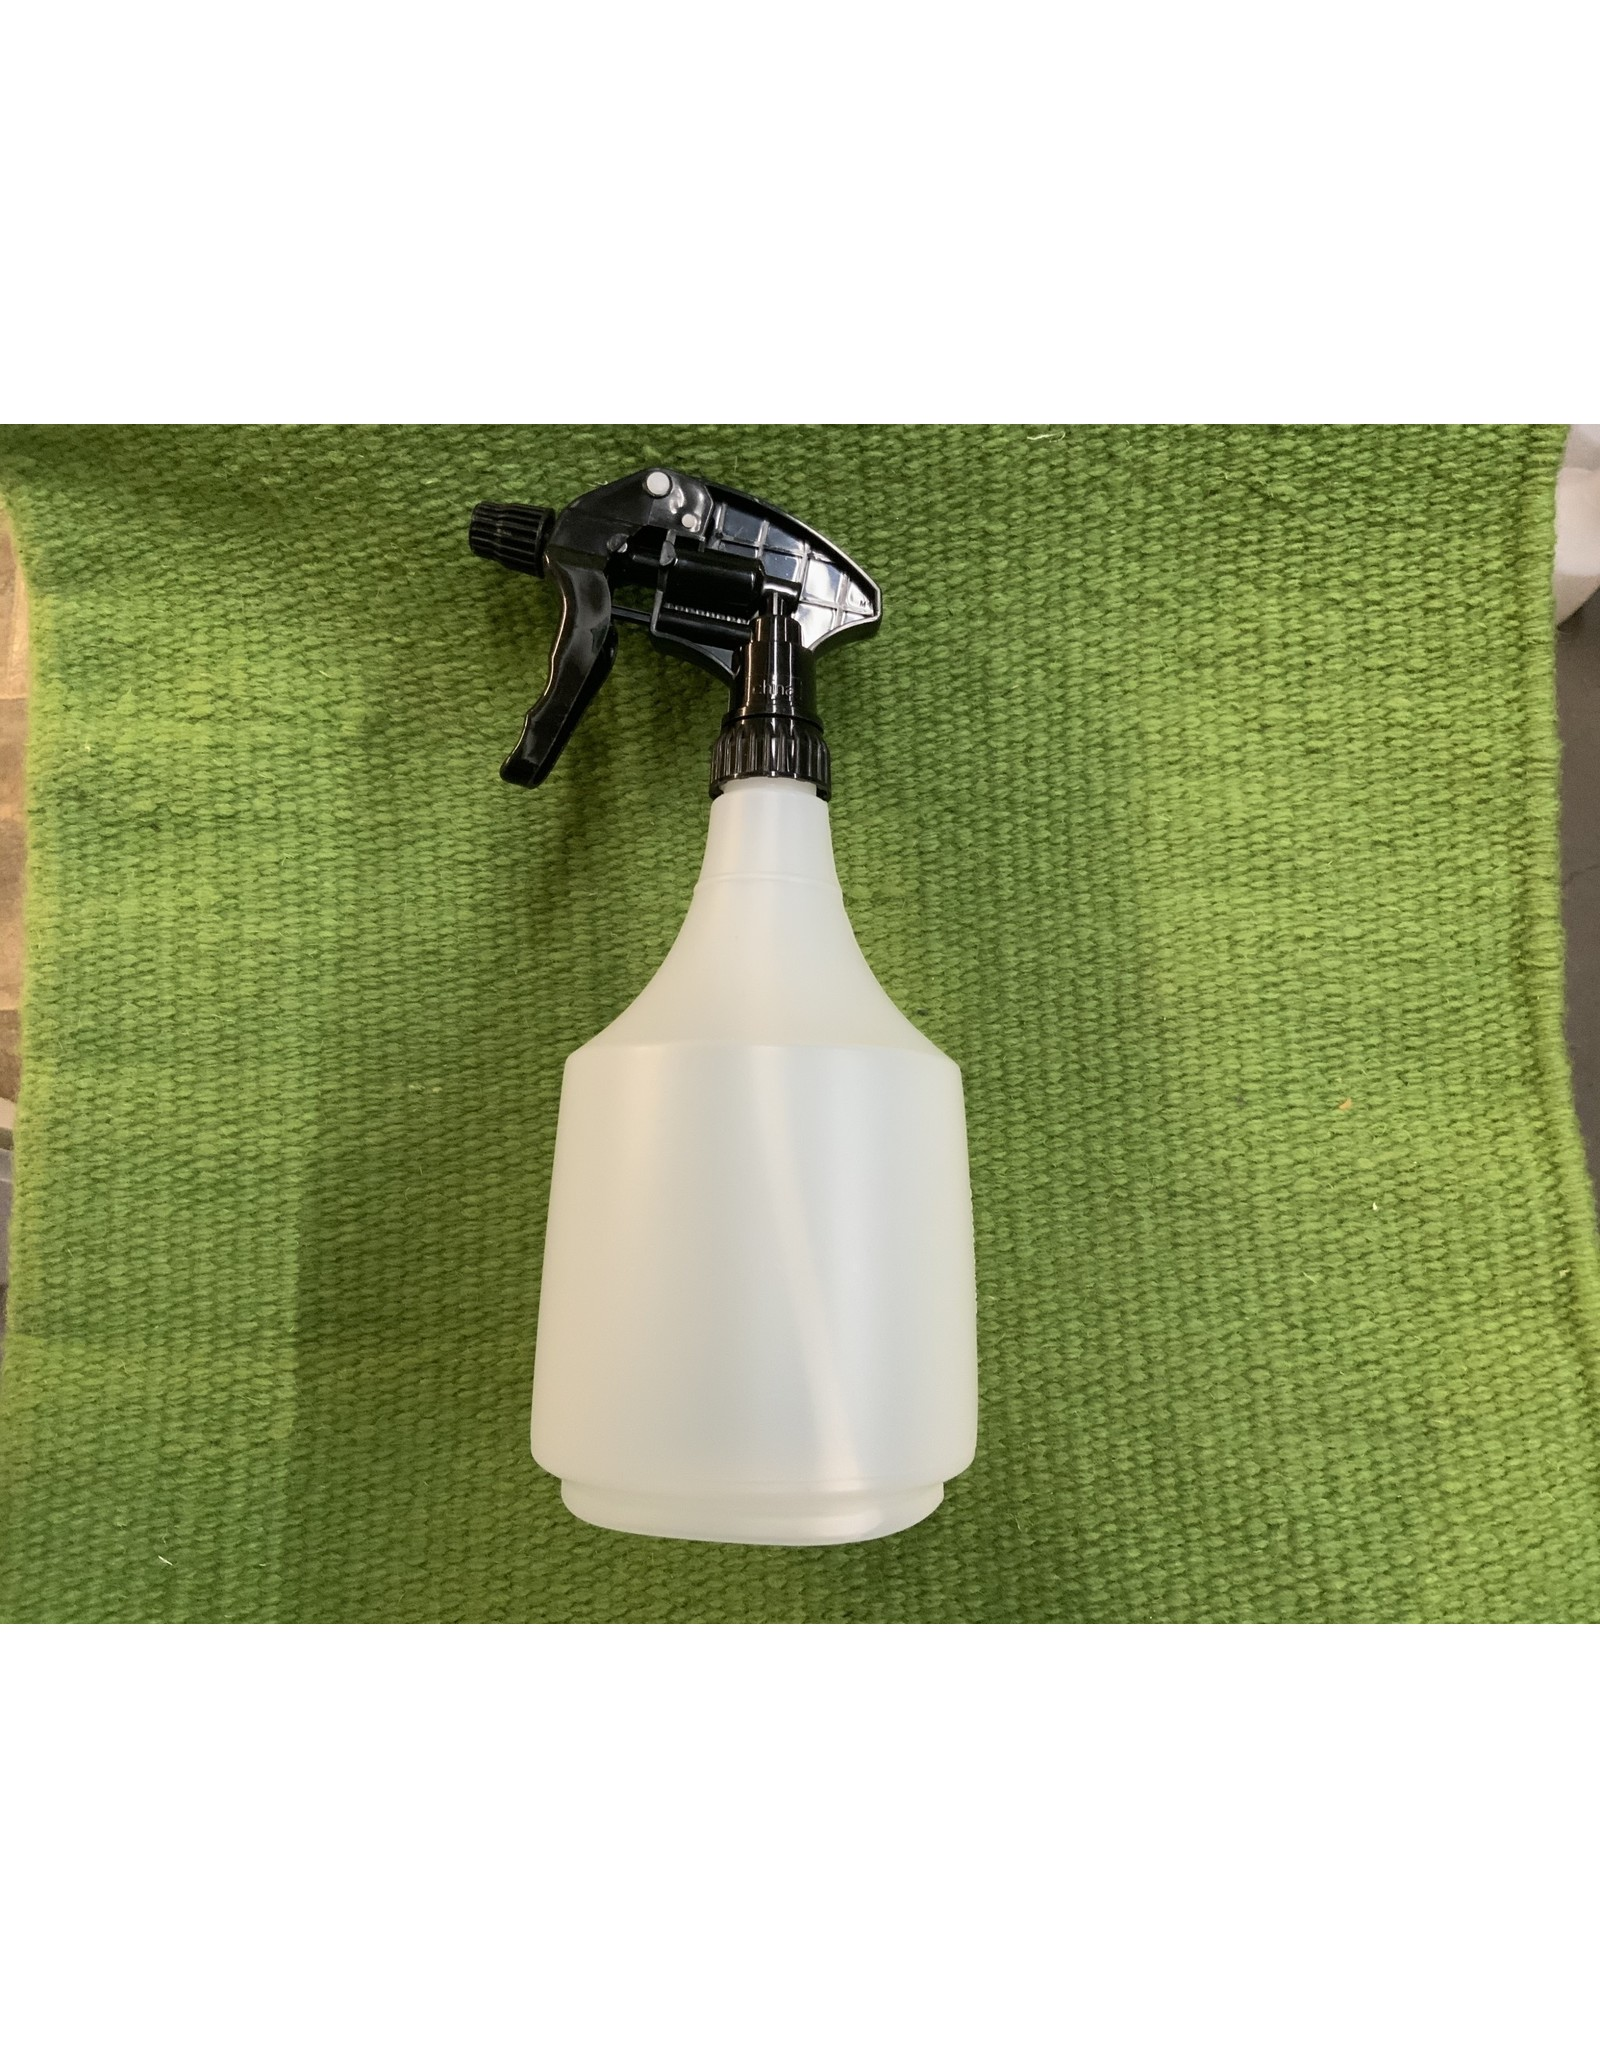 Black Horse Sprayer 32oz 115-821